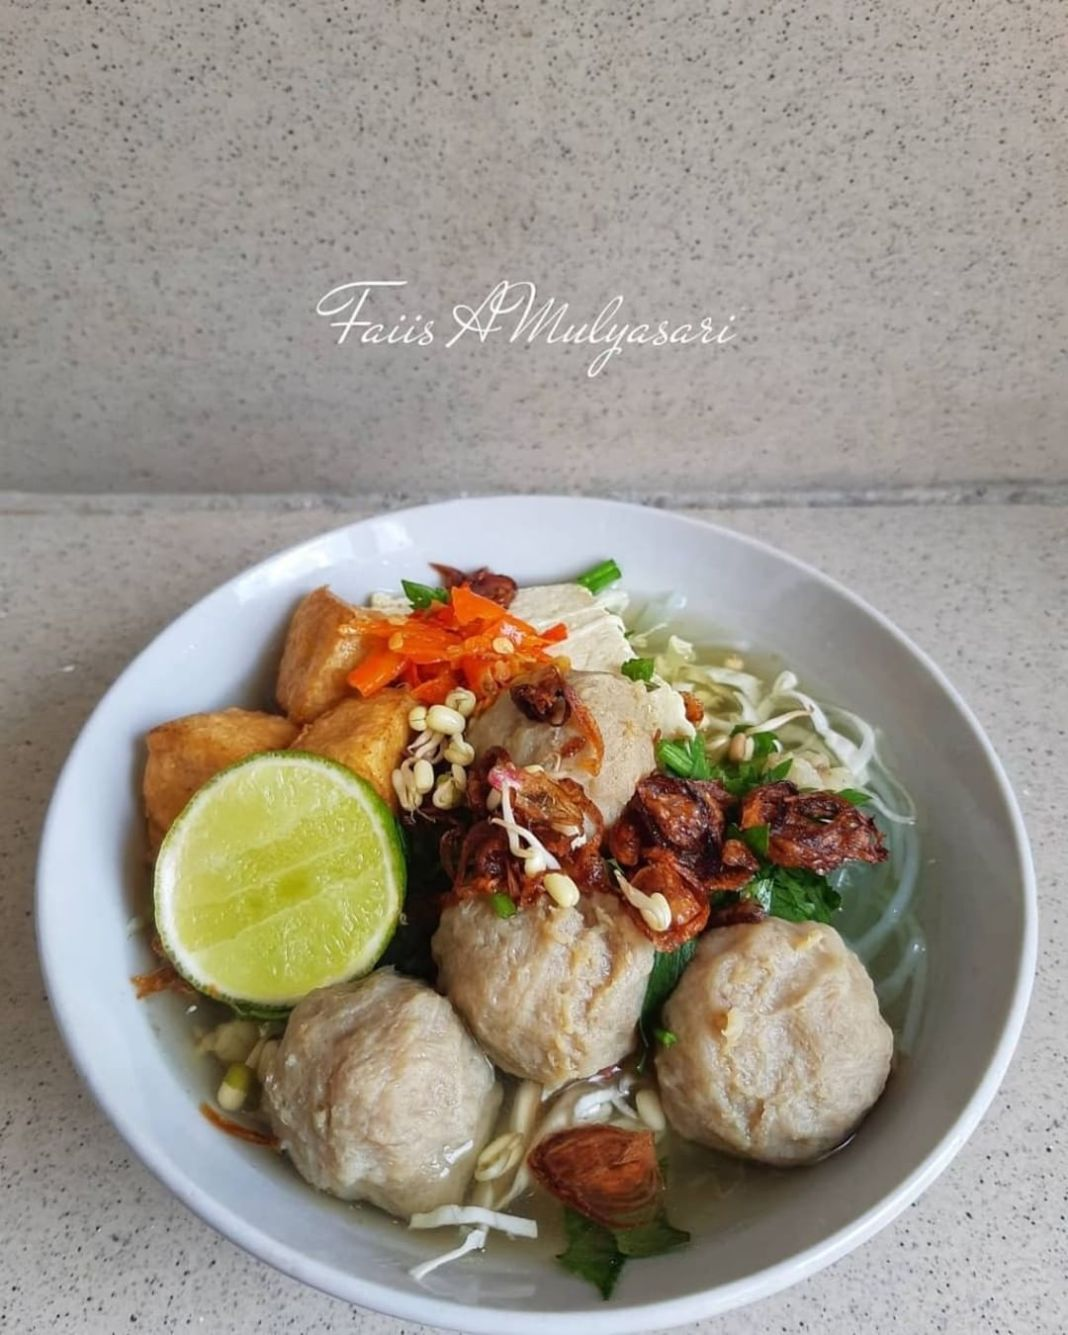 Info kuliner, HAPPY LUNCH SEMUAH  Menu makan siang kita hari ini #bakso#baksodagingserta kawan kawannya …. …